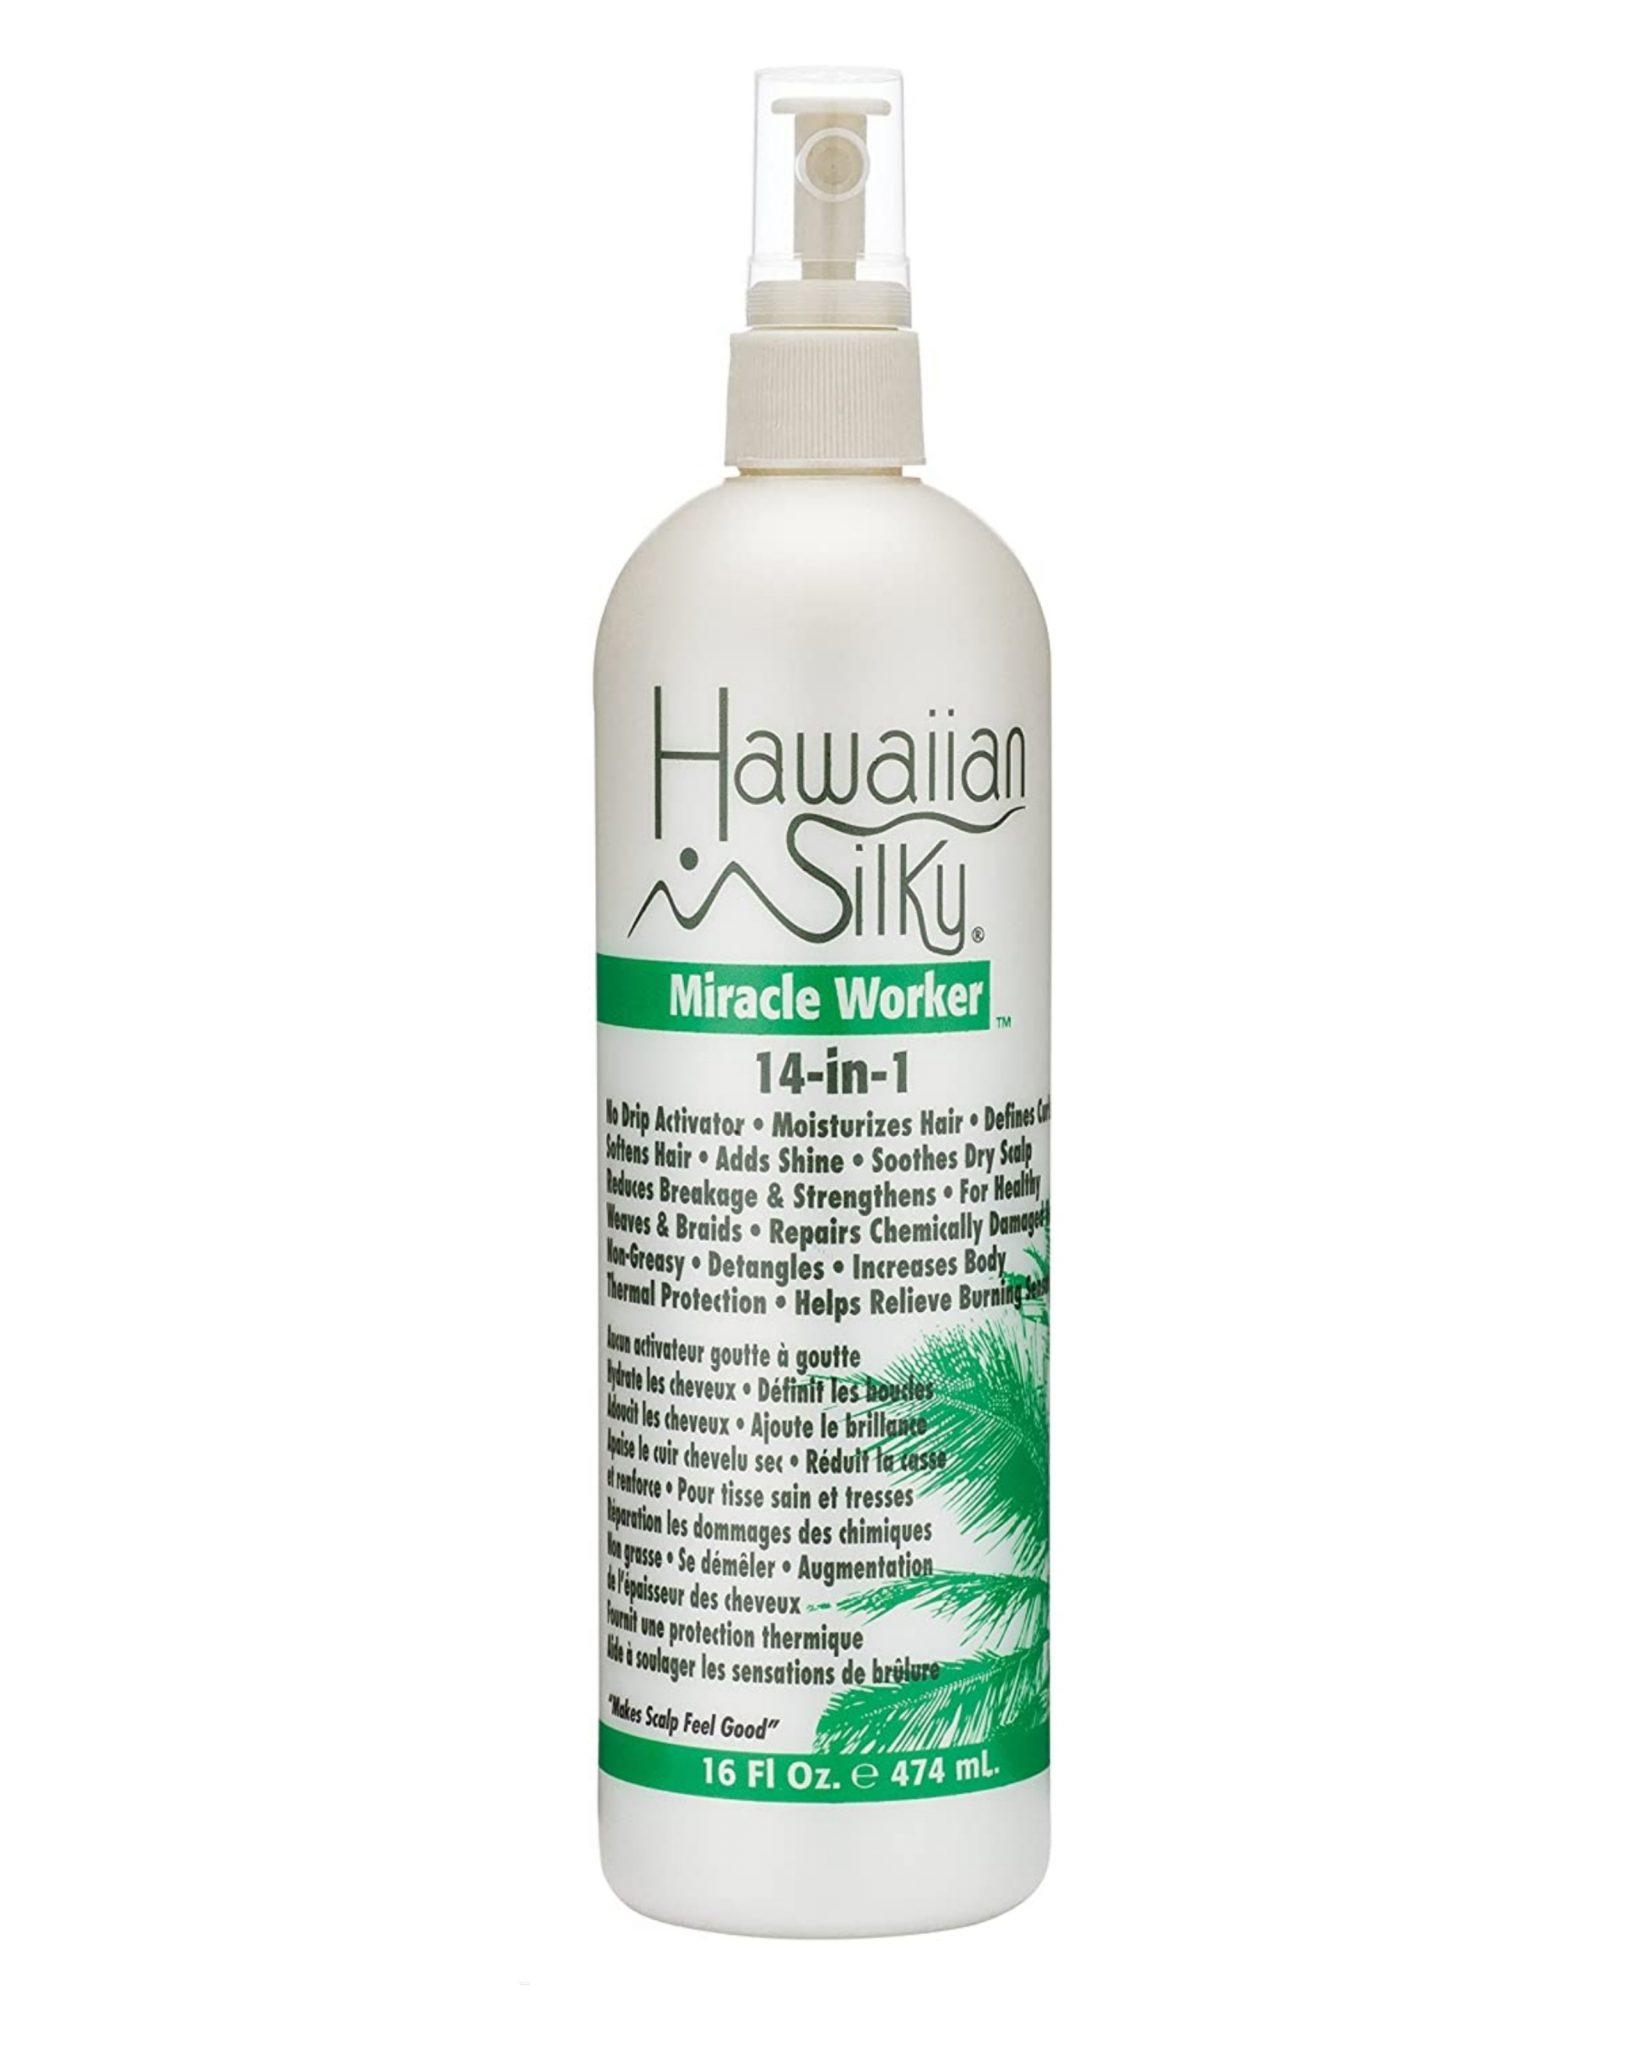 Hawaiian Silky 14-in-1 Miracle Worker Activator & Moisturizer 16Oz